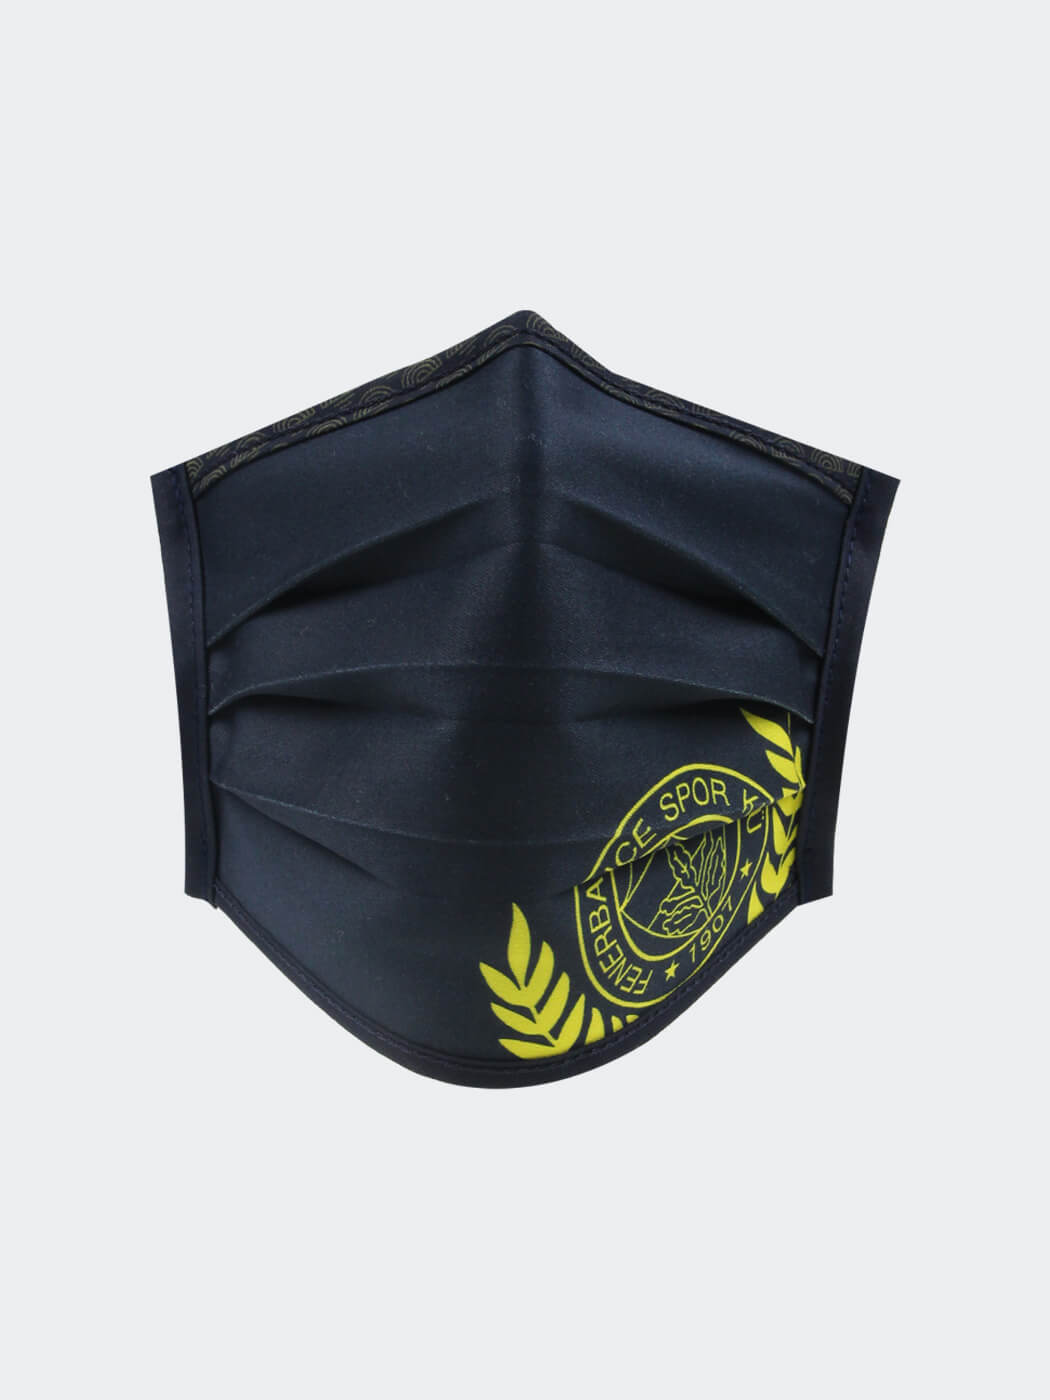 Fenerbahçe Lacivert Çelenk Logo Maske